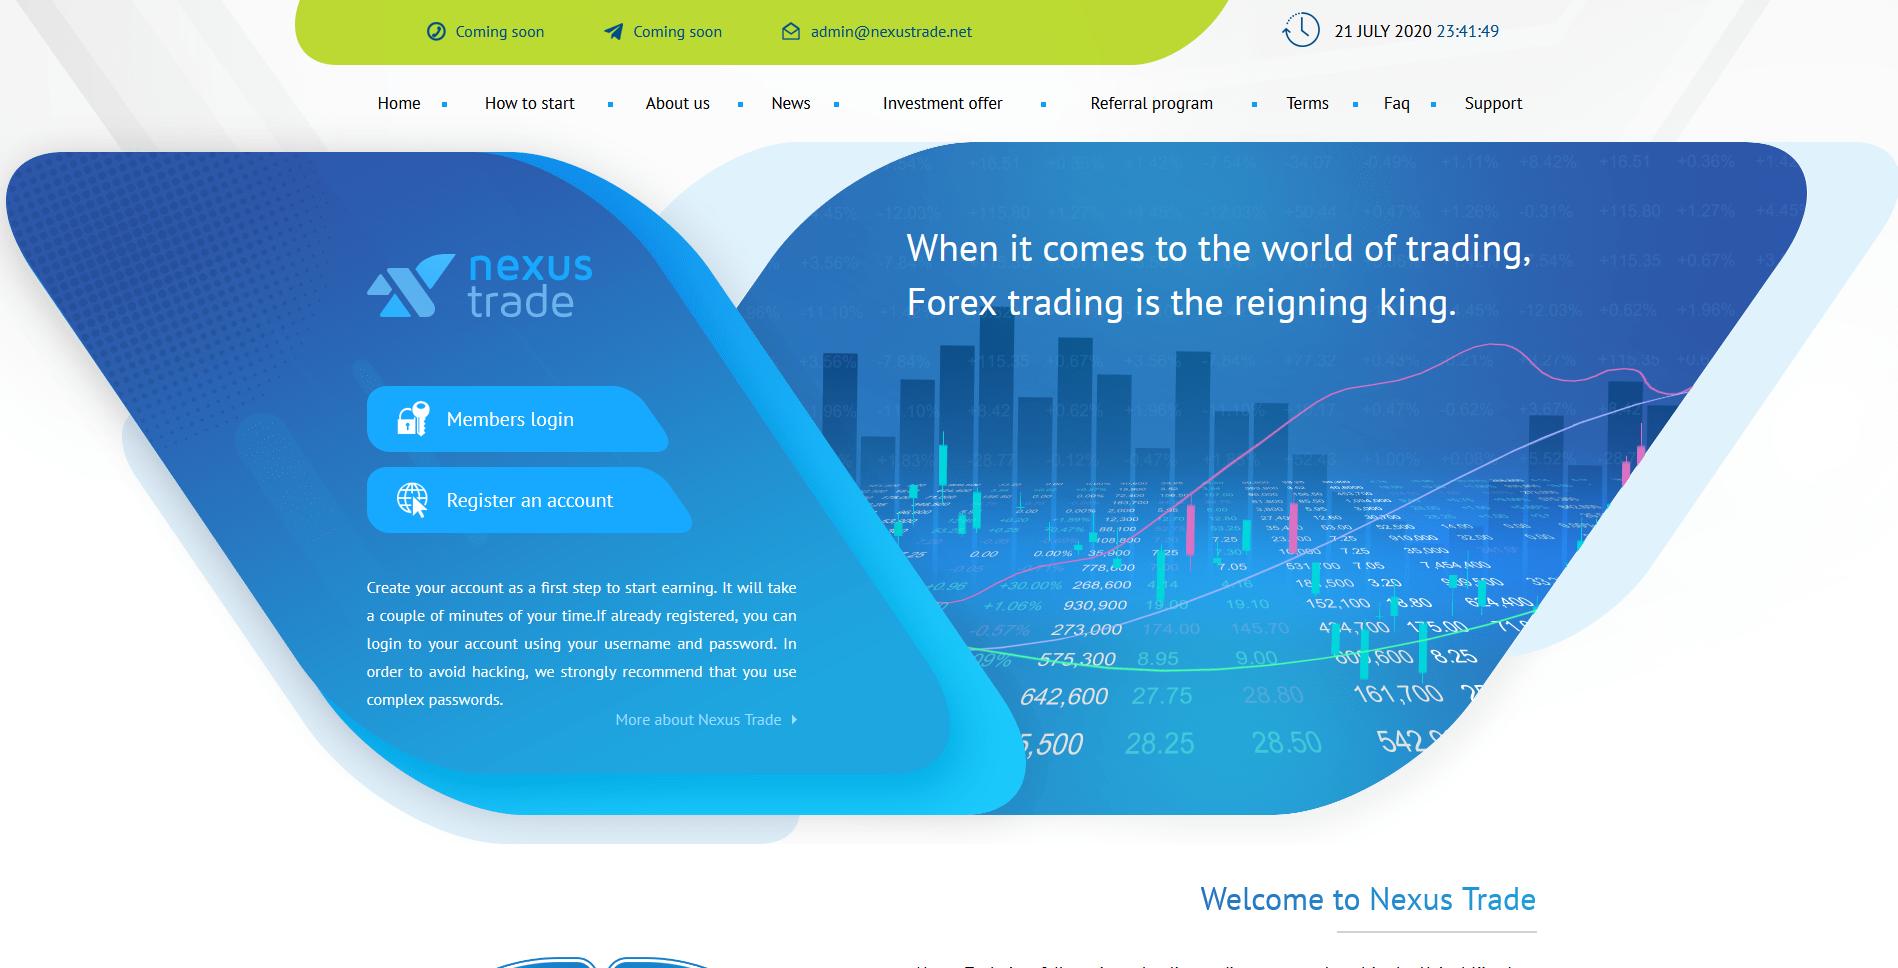 NEXUS TRADE - nexustrade.net